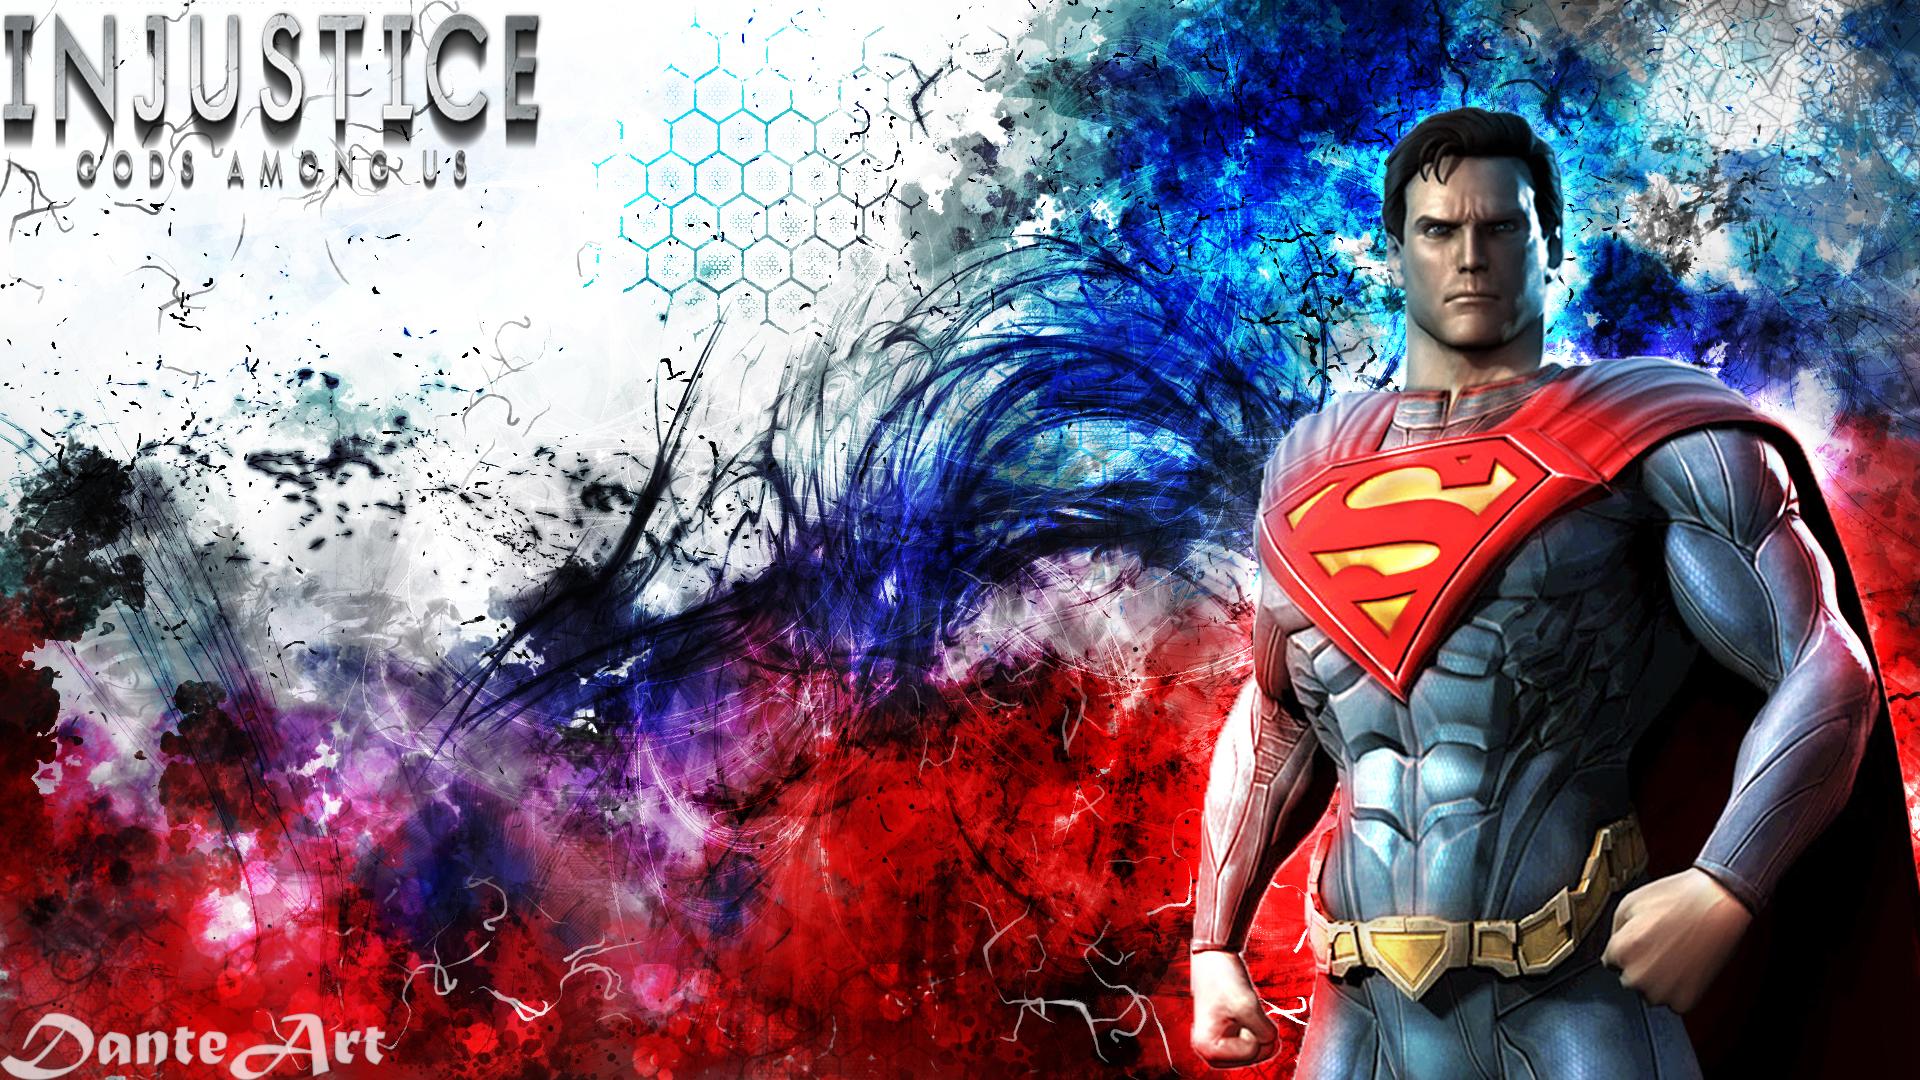 Injustice gods among us ultimate edition superman wallpapers injustice gods among us ultimate edition superman voltagebd Images